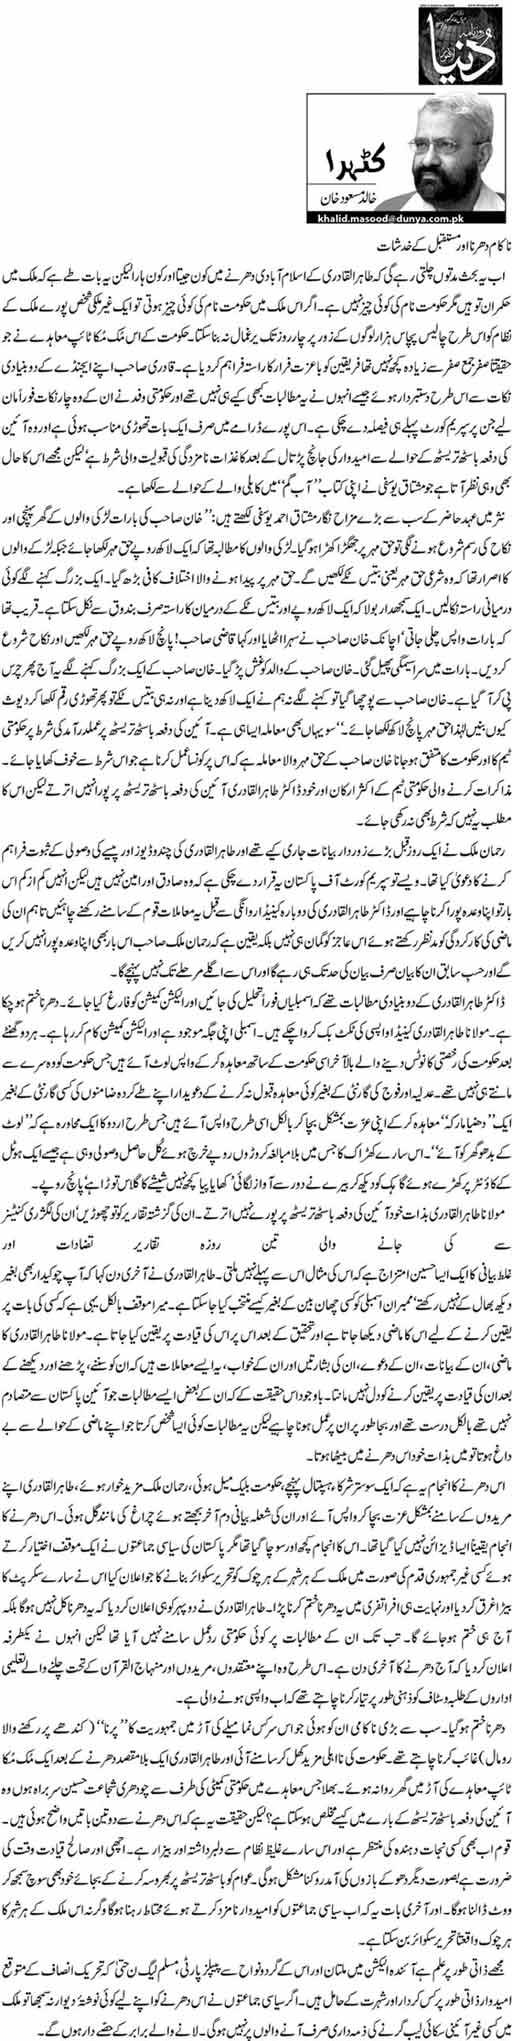 Na kaam dharna aur mustaqbil k khadshaat - Khalid Masood Khan